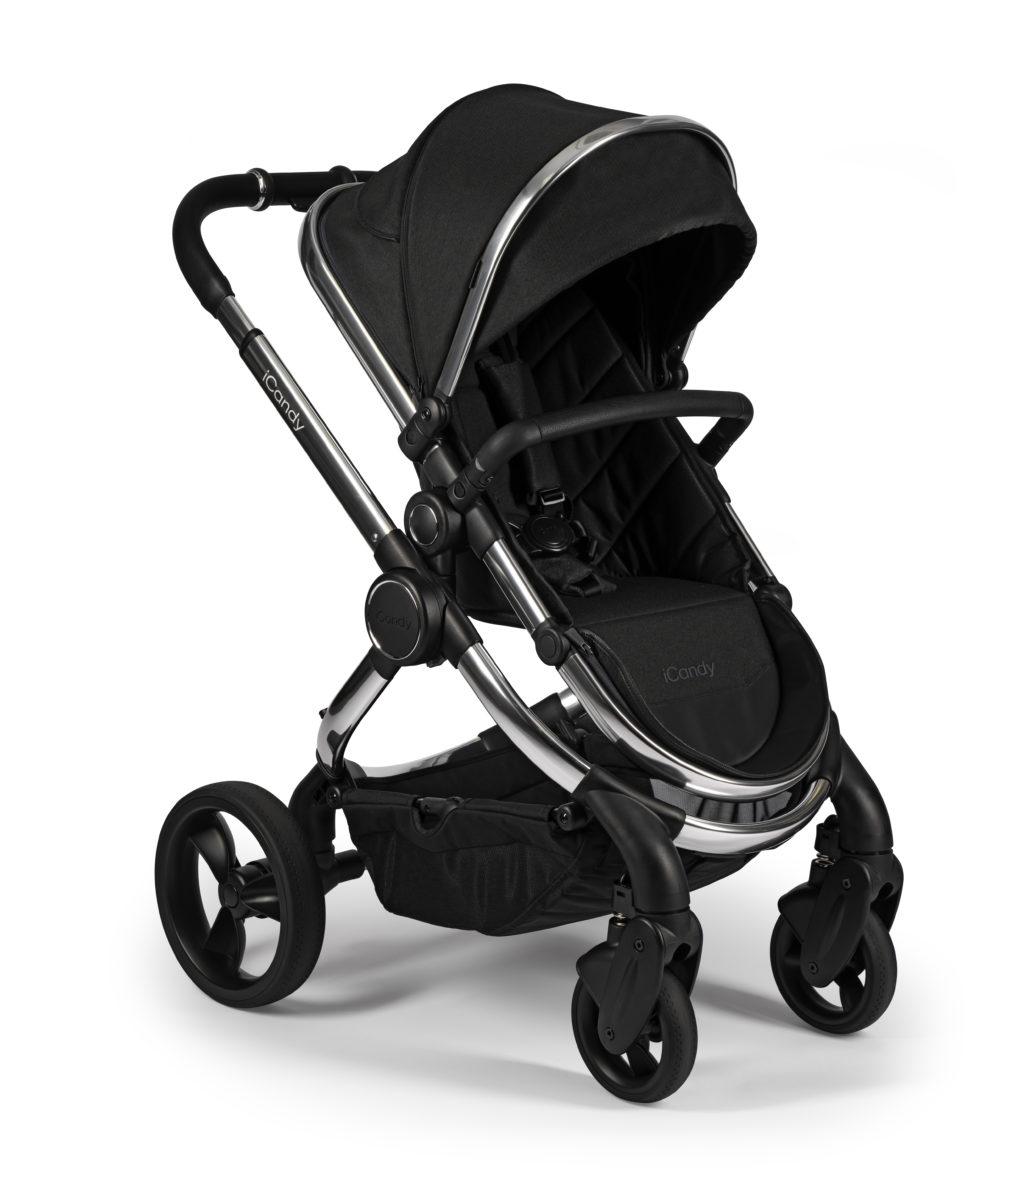 Peach 2020 Black Twill on Chrome – Seat Unit